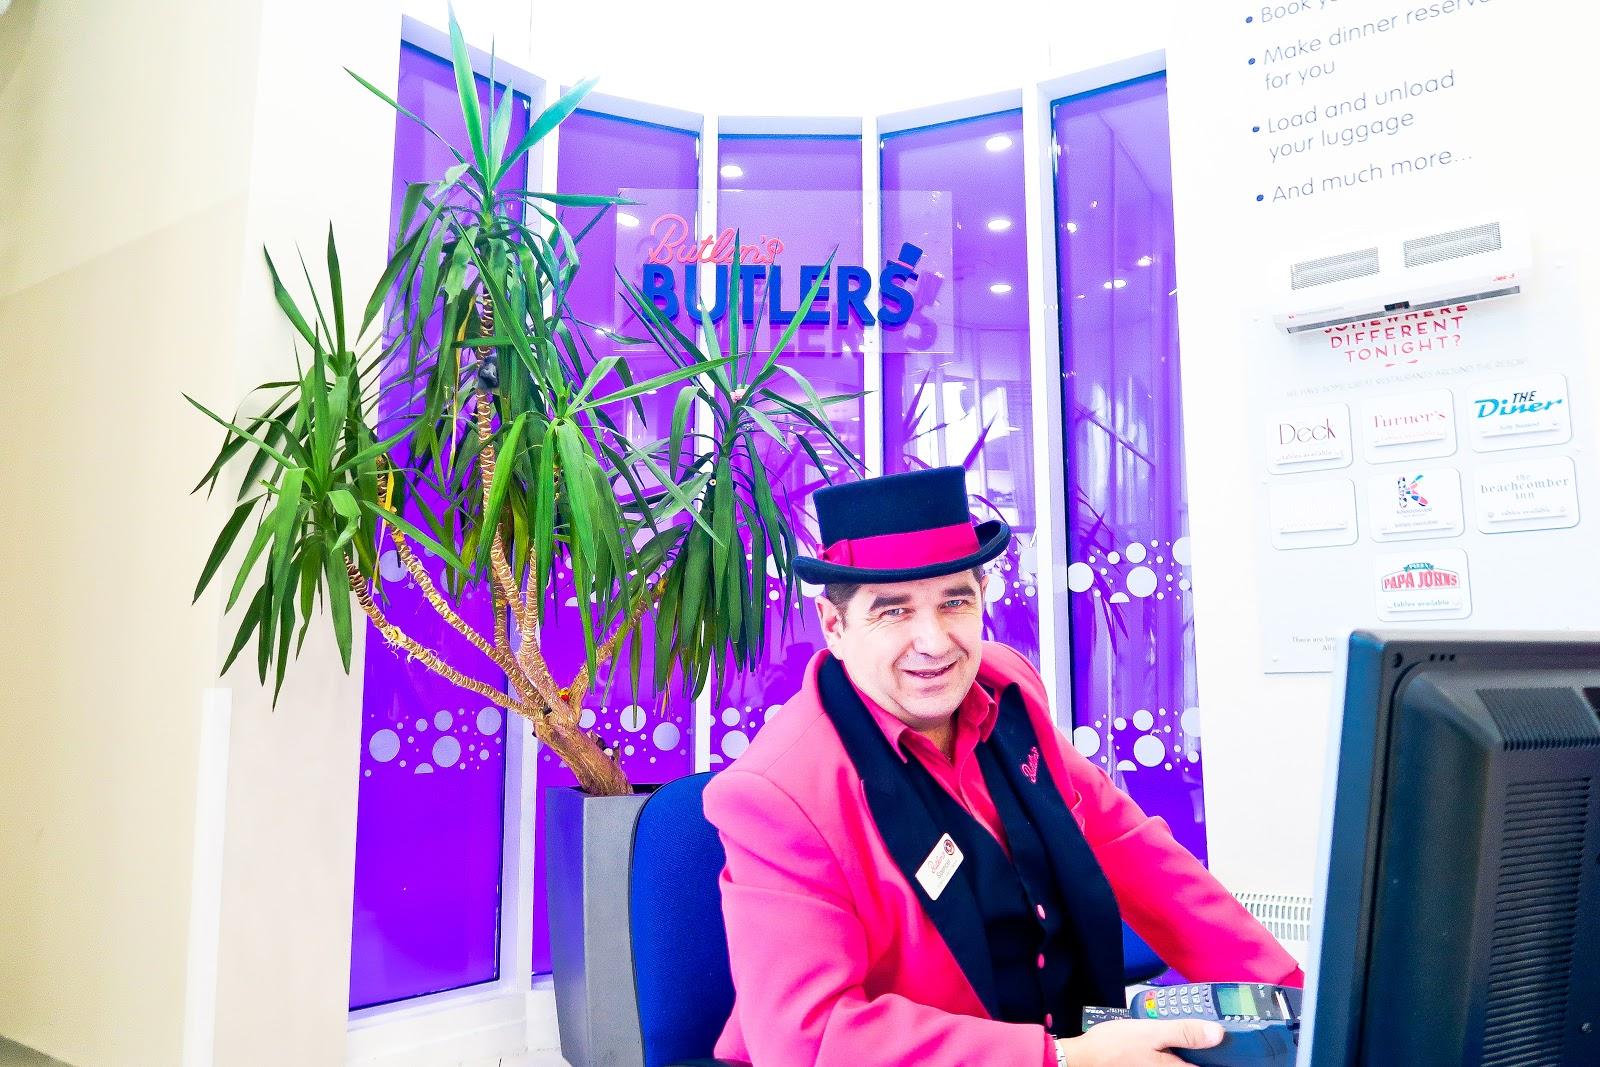 butlins butlers, ocean hotel butlins, Butlins bognor regis just for tots review, butlins, butlins bognor regis, just for tots, uk holiday for kids under 5,